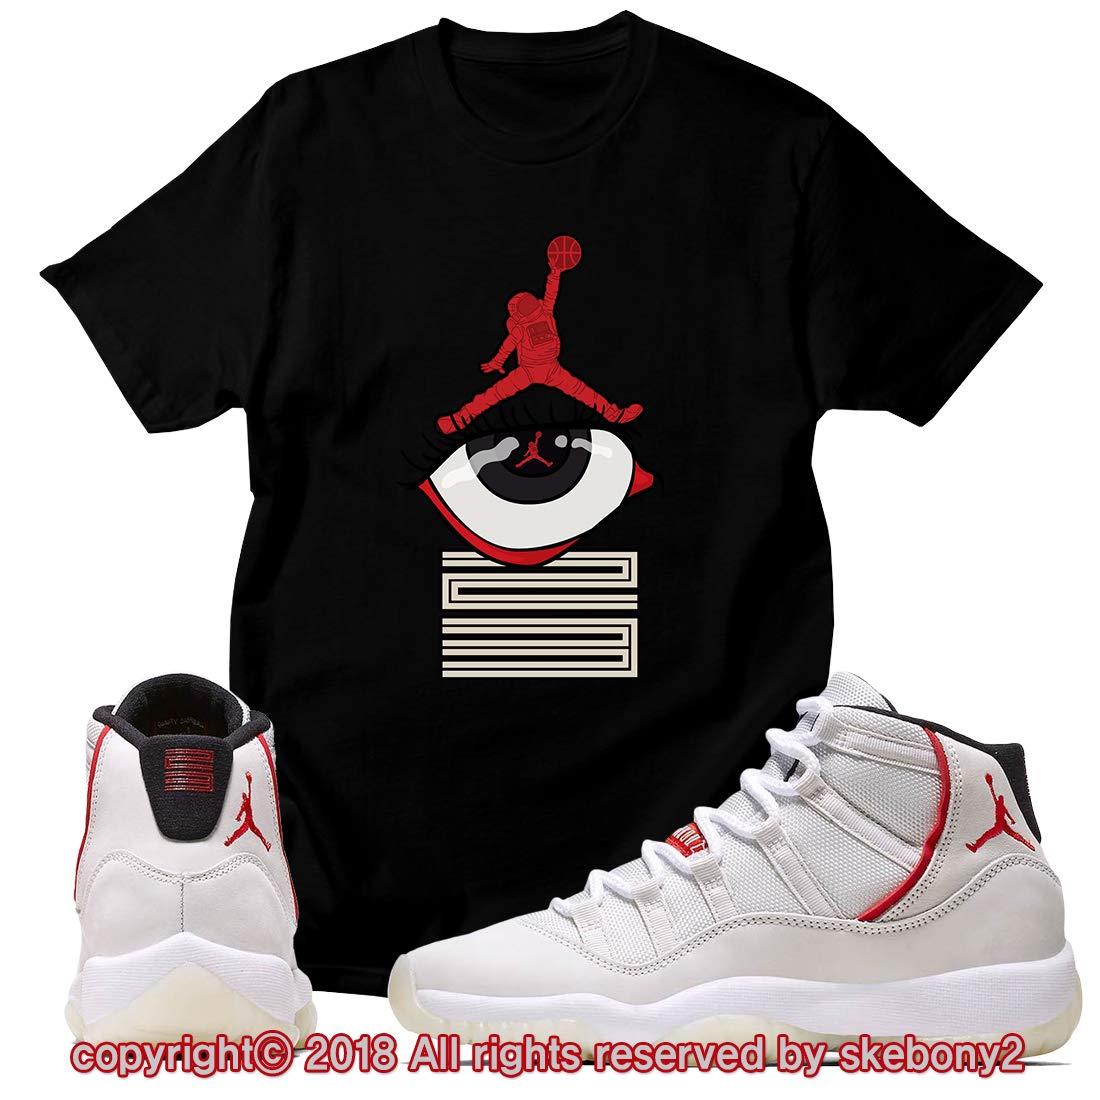 964d2764cdfea2 Custom T Shirt Matching Style of Air Jordan 11 Platinum Tint JD 11-4-2-6 at  Amazon Men s Clothing store